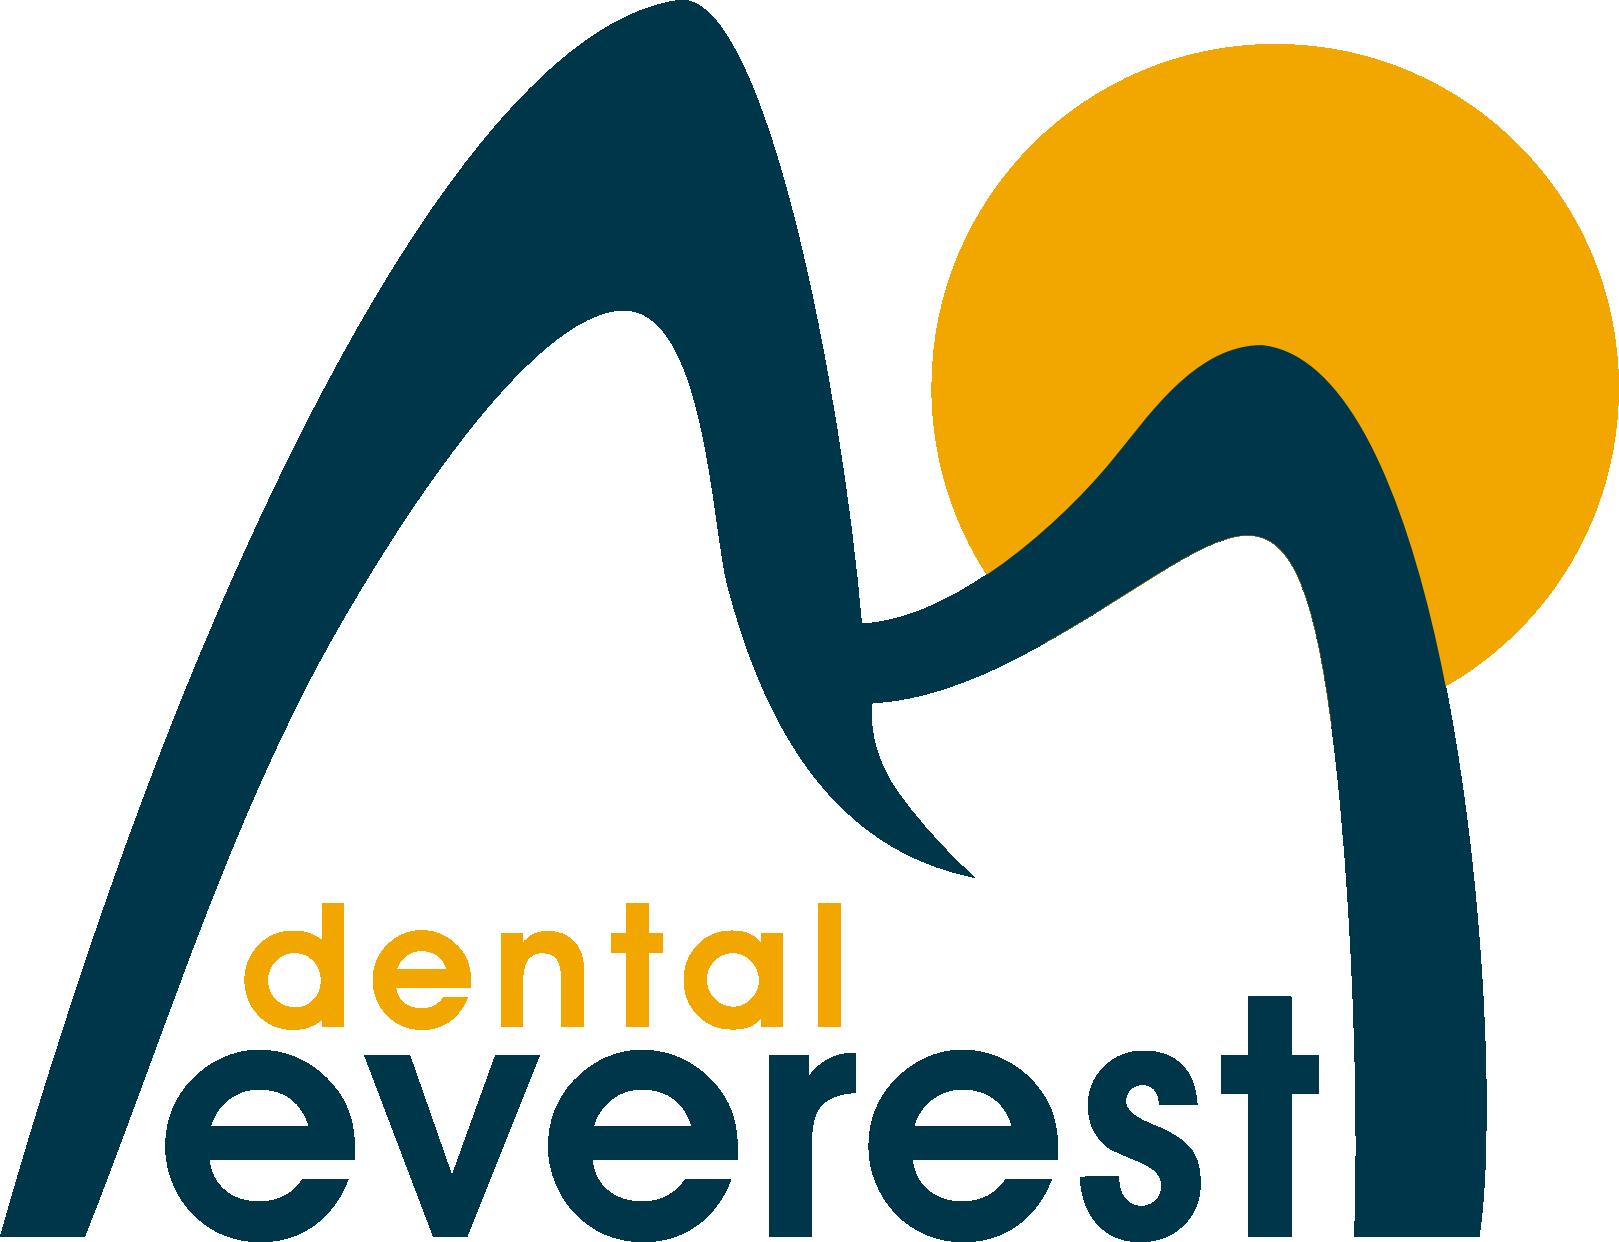 Dental Everest | Depósito dental